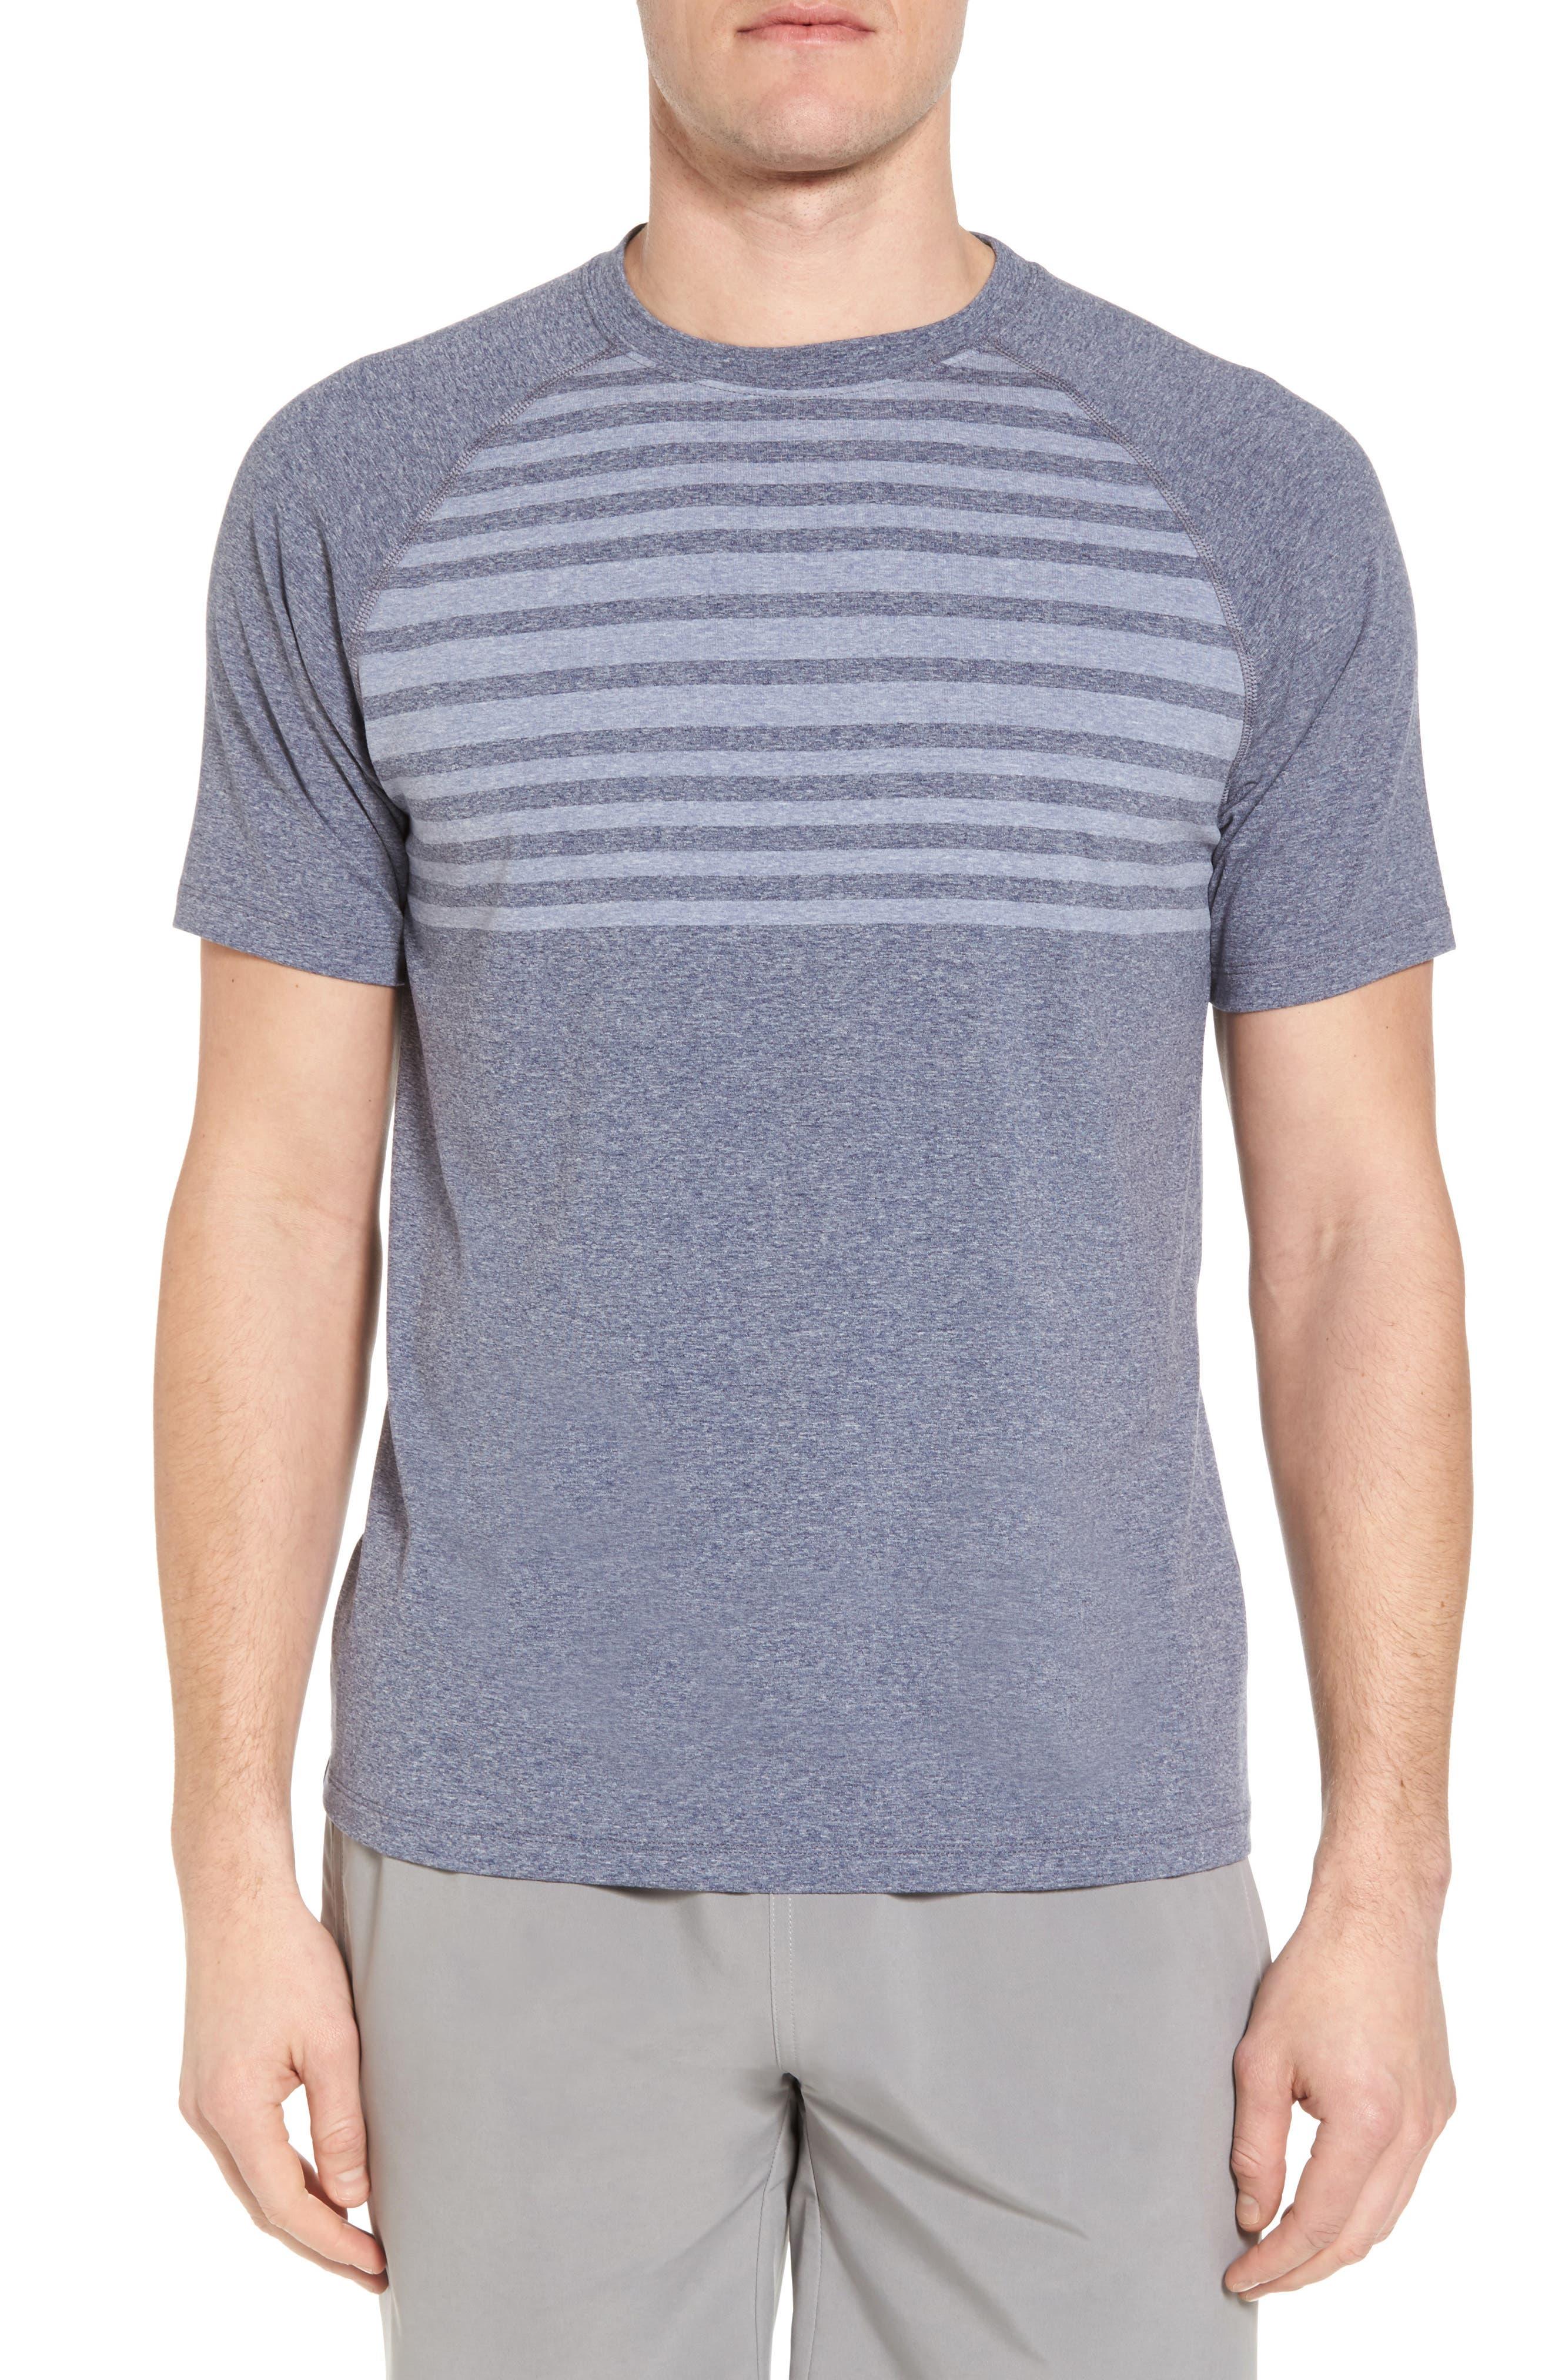 Main Image - Peter Millar Rio Stripe Technical T-Shirt